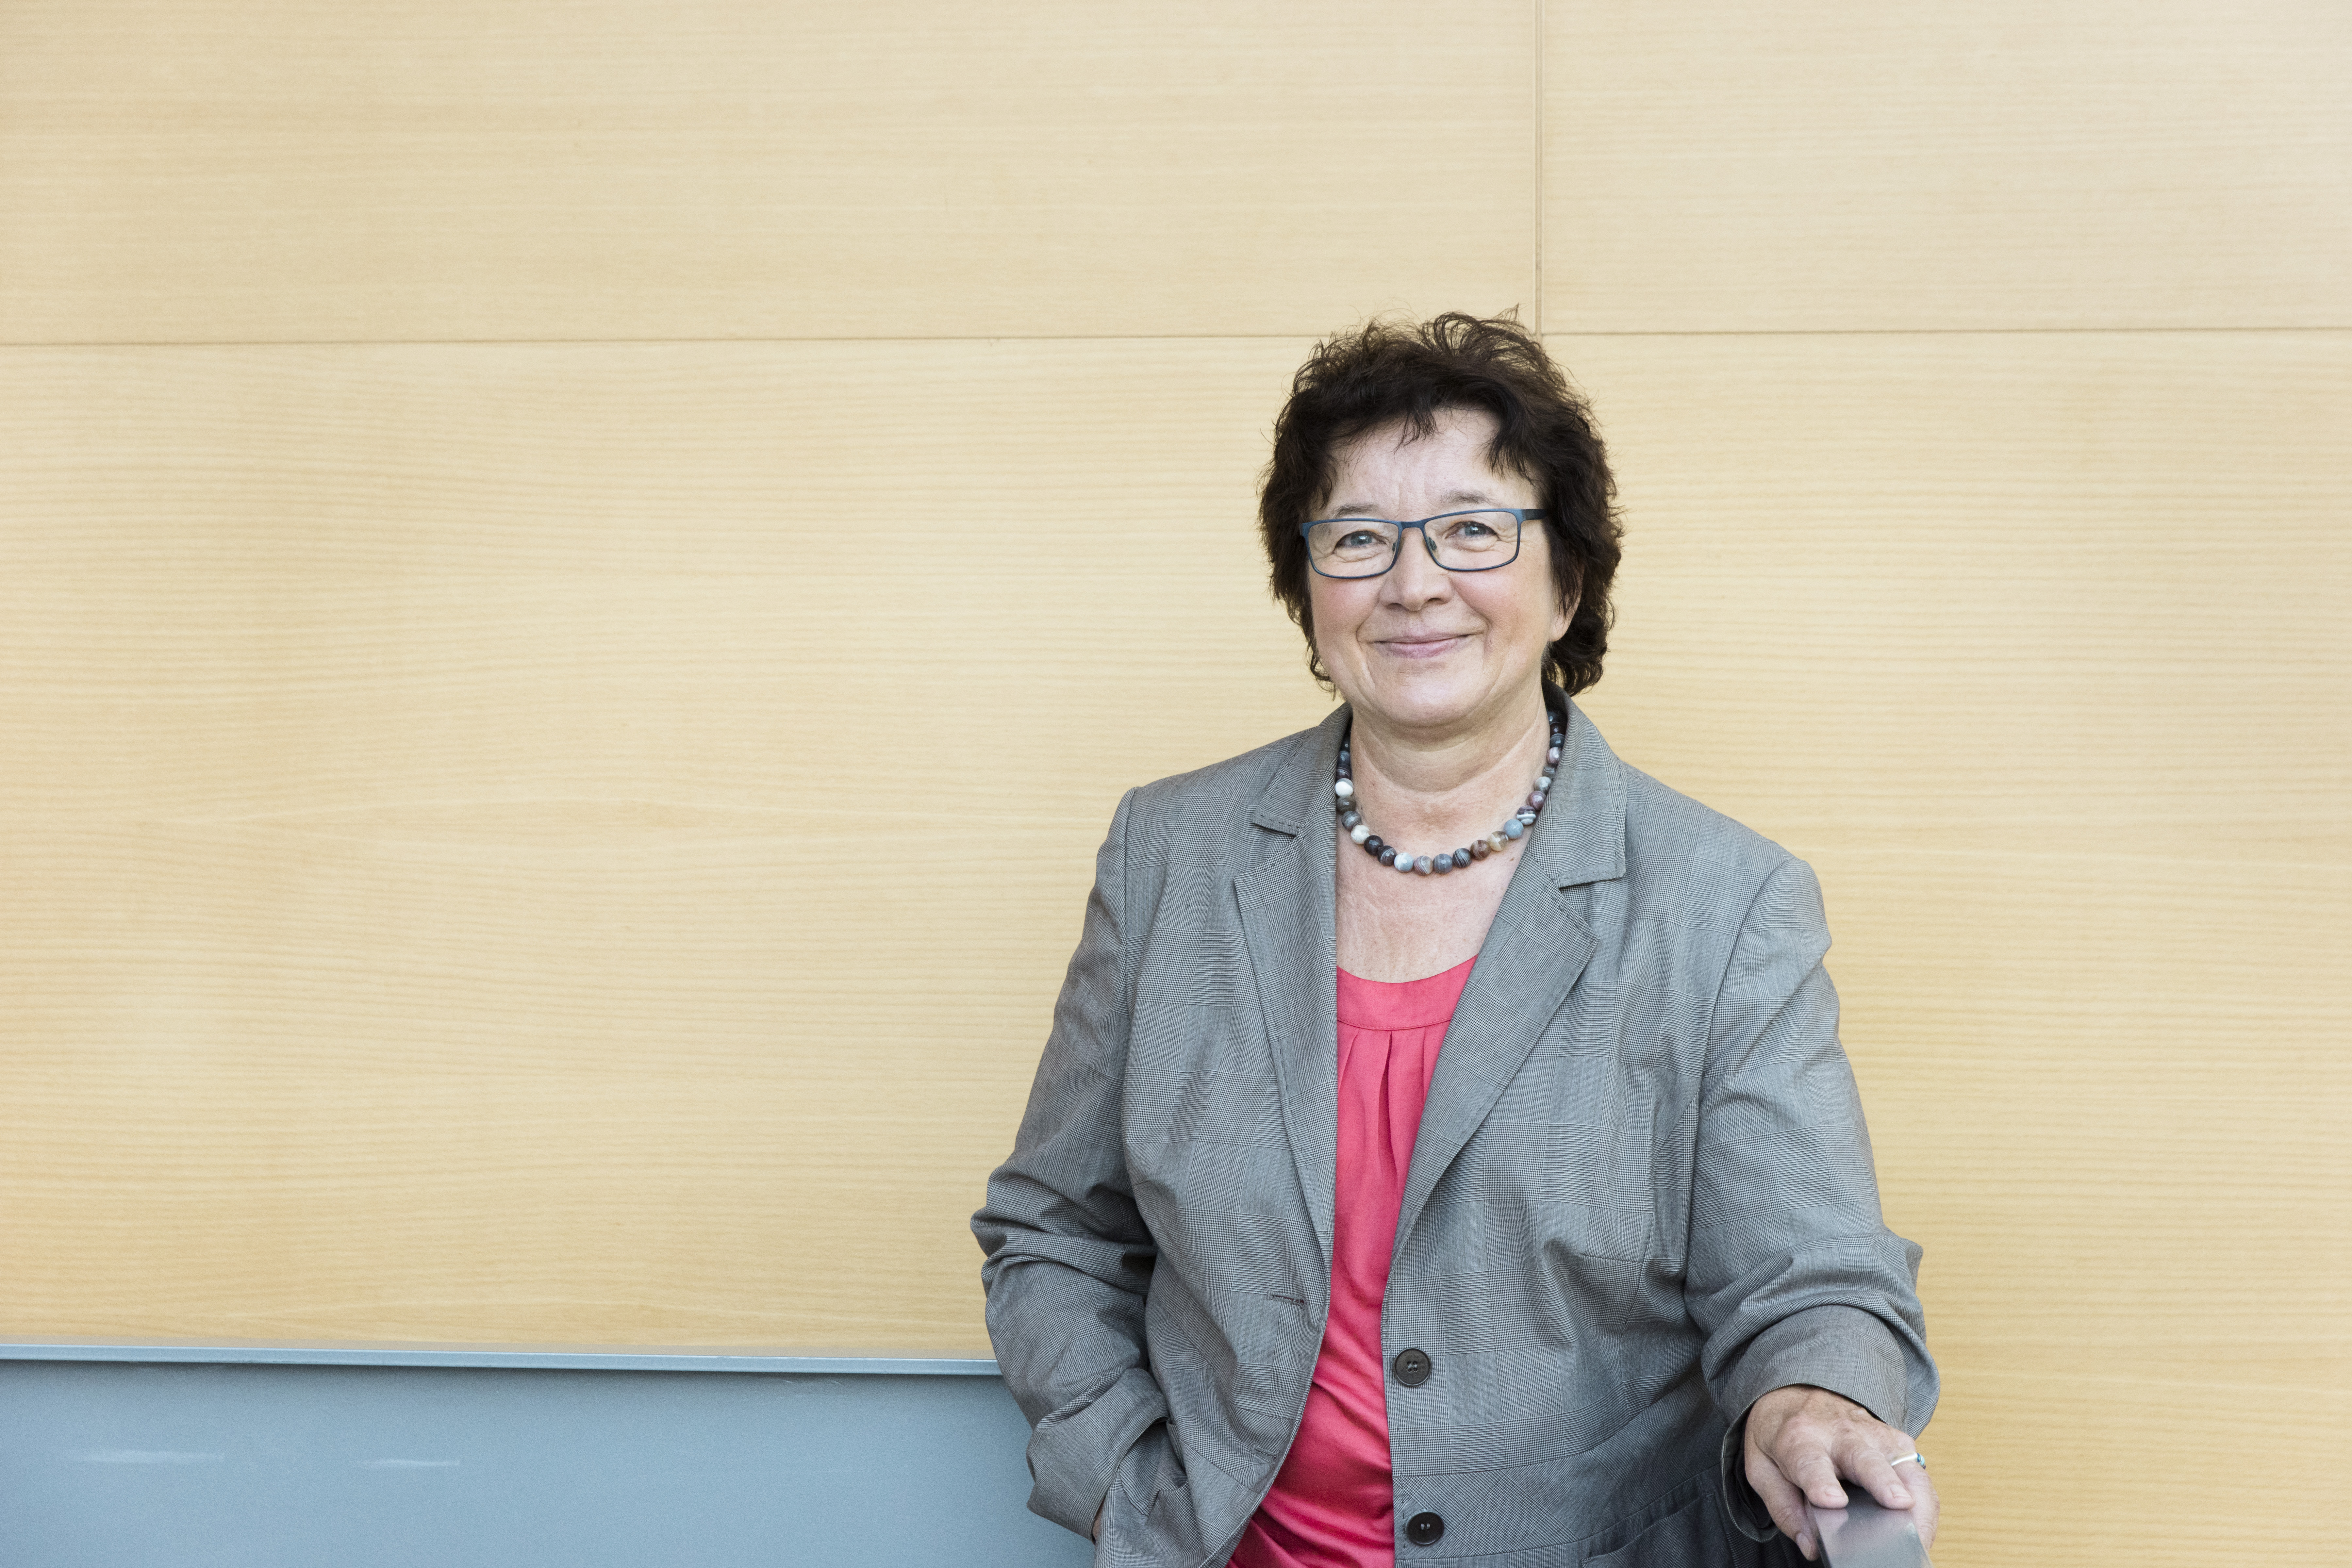 Barbara Gisler-Haase